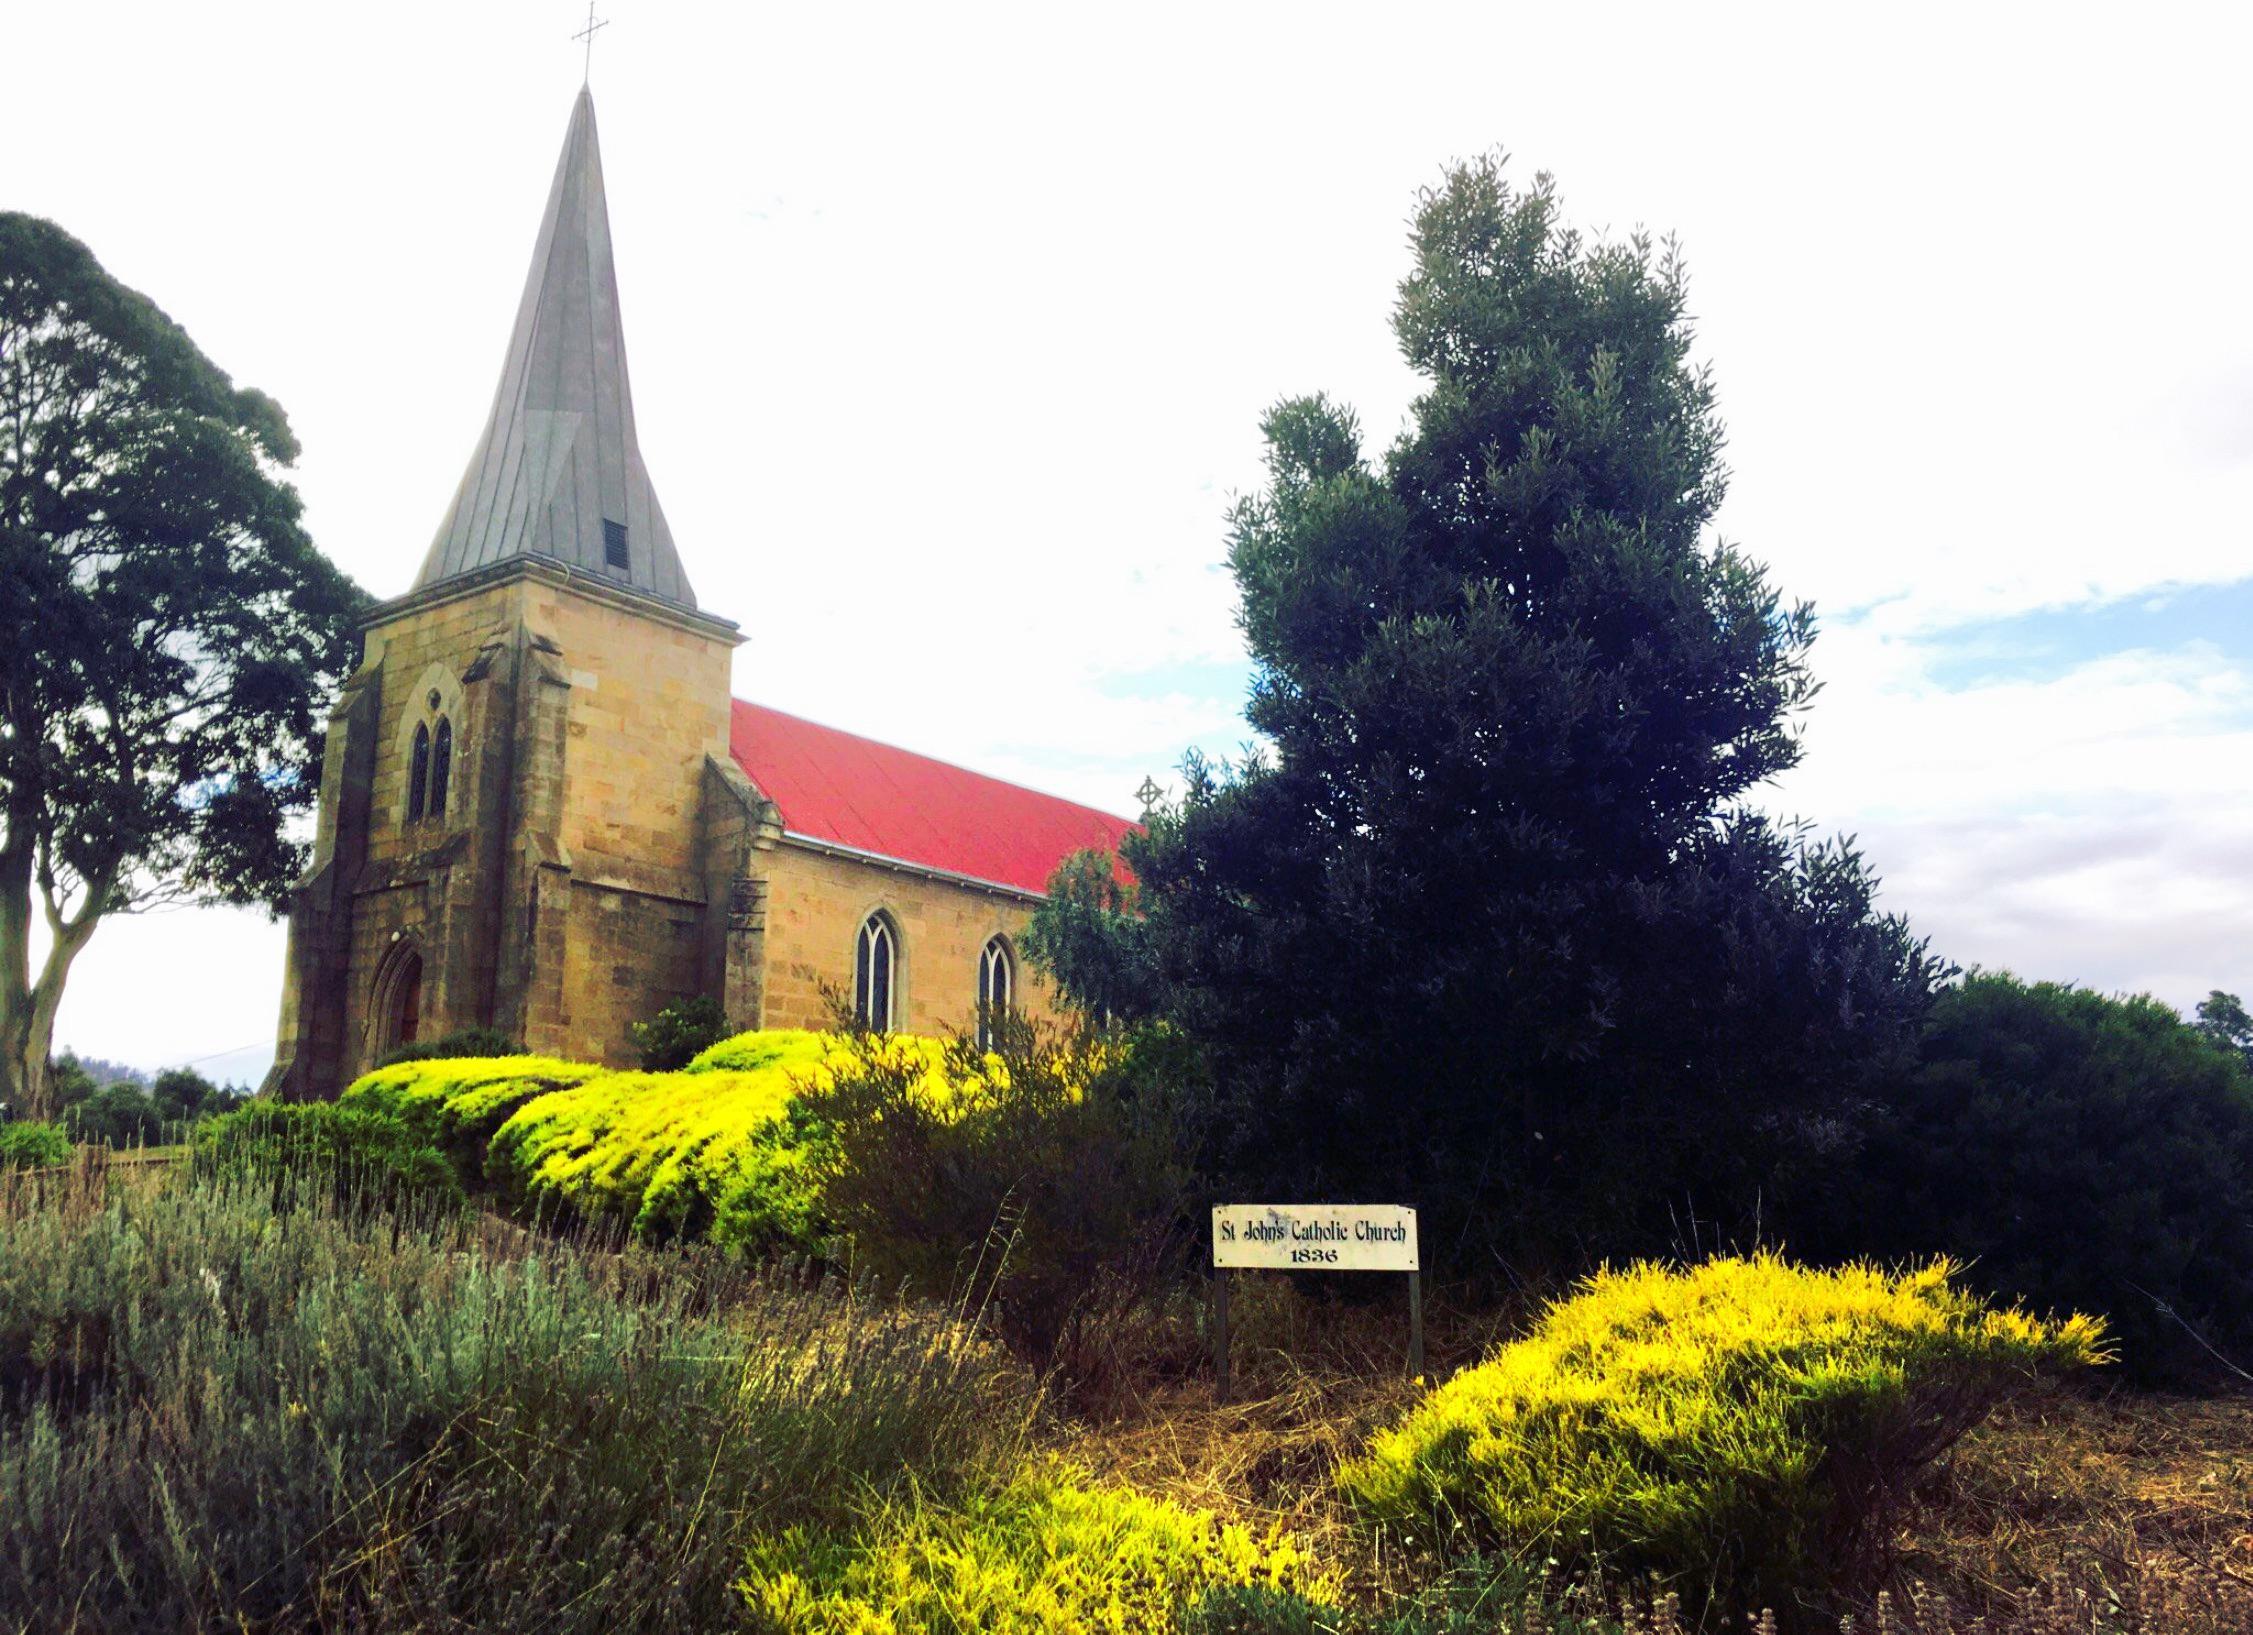 St John the Evangelist Roman Catholic Church